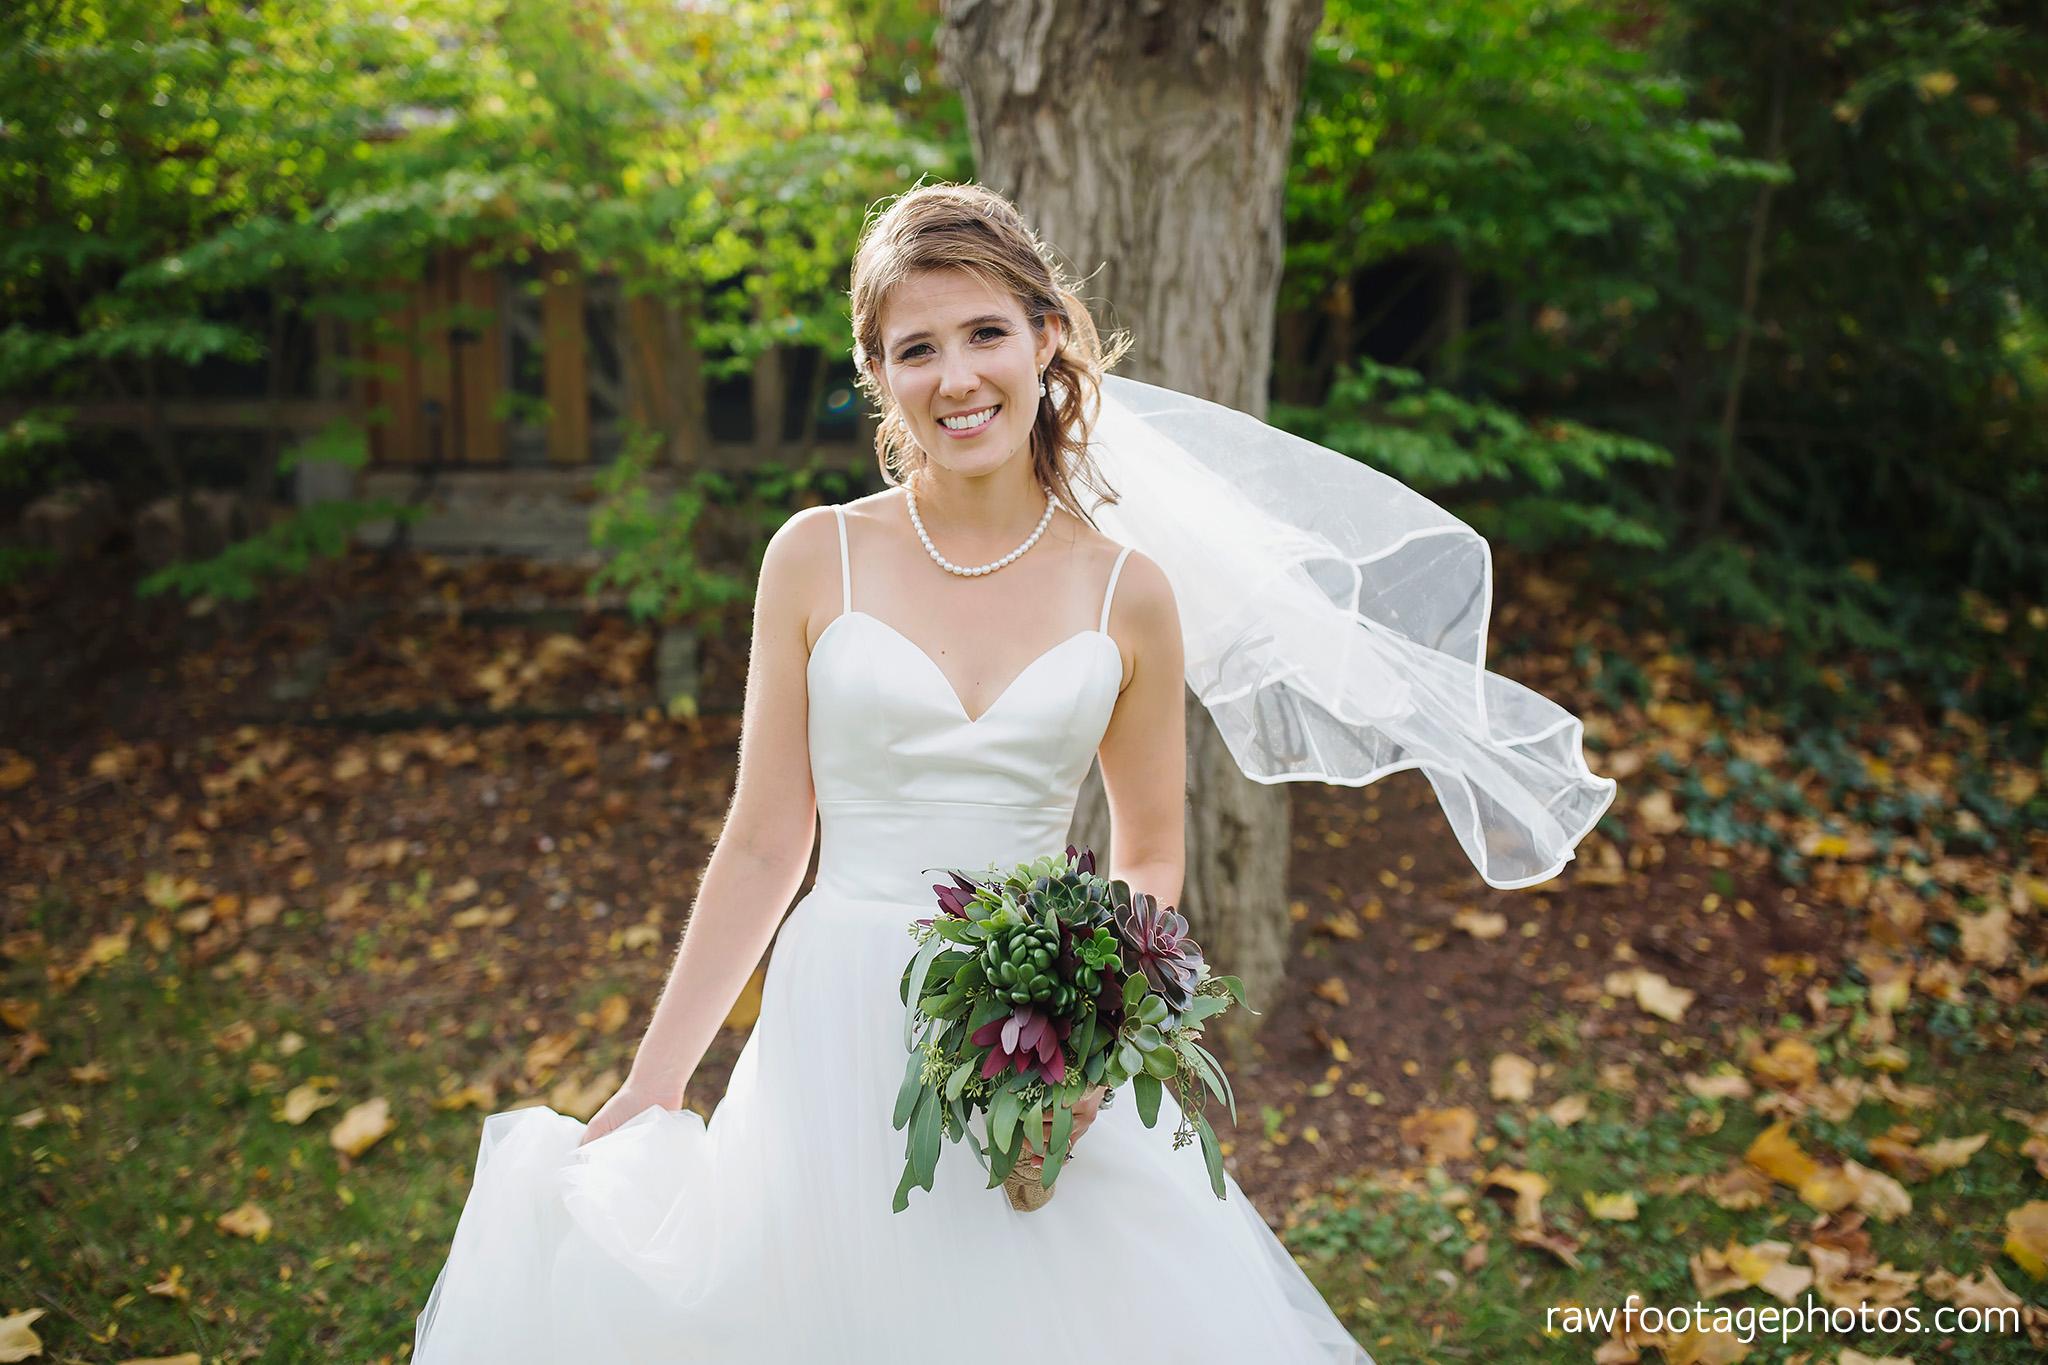 london_ontario_wedding_photographer-civic_gardens-springbank_park-succulent_bouquet-fall_wedding-bridge-raw_footage_photography013.jpg